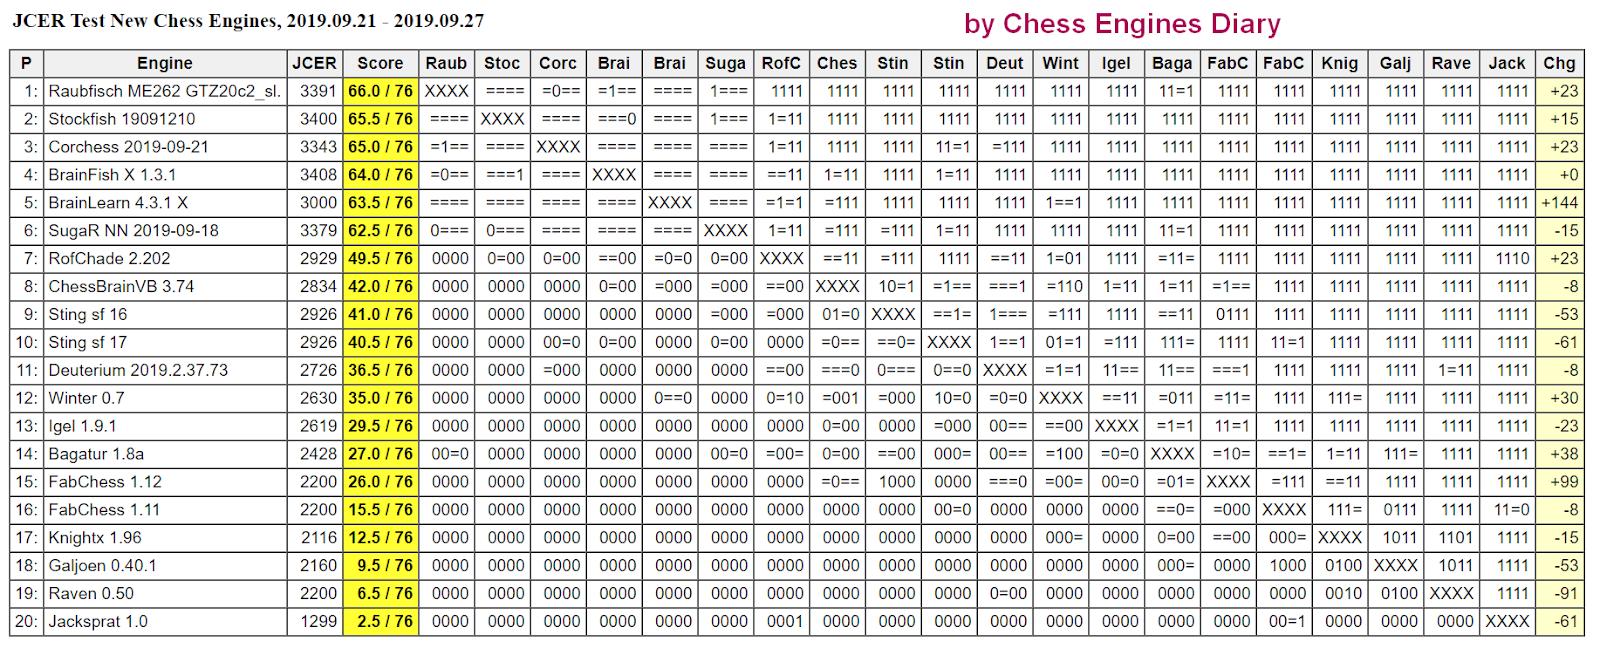 JCER (Jurek Chess Engines Rating) tournaments - Page 18 2019.09.21.TestNewChessEnginesScid.html